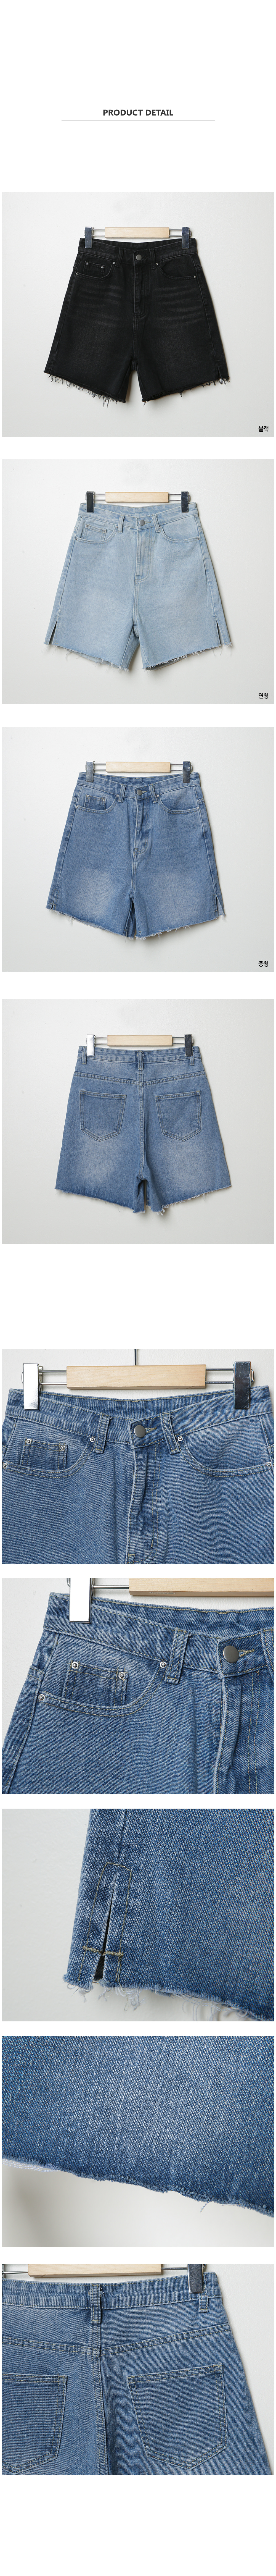 Daily high waist shorts cut Split P # YW632